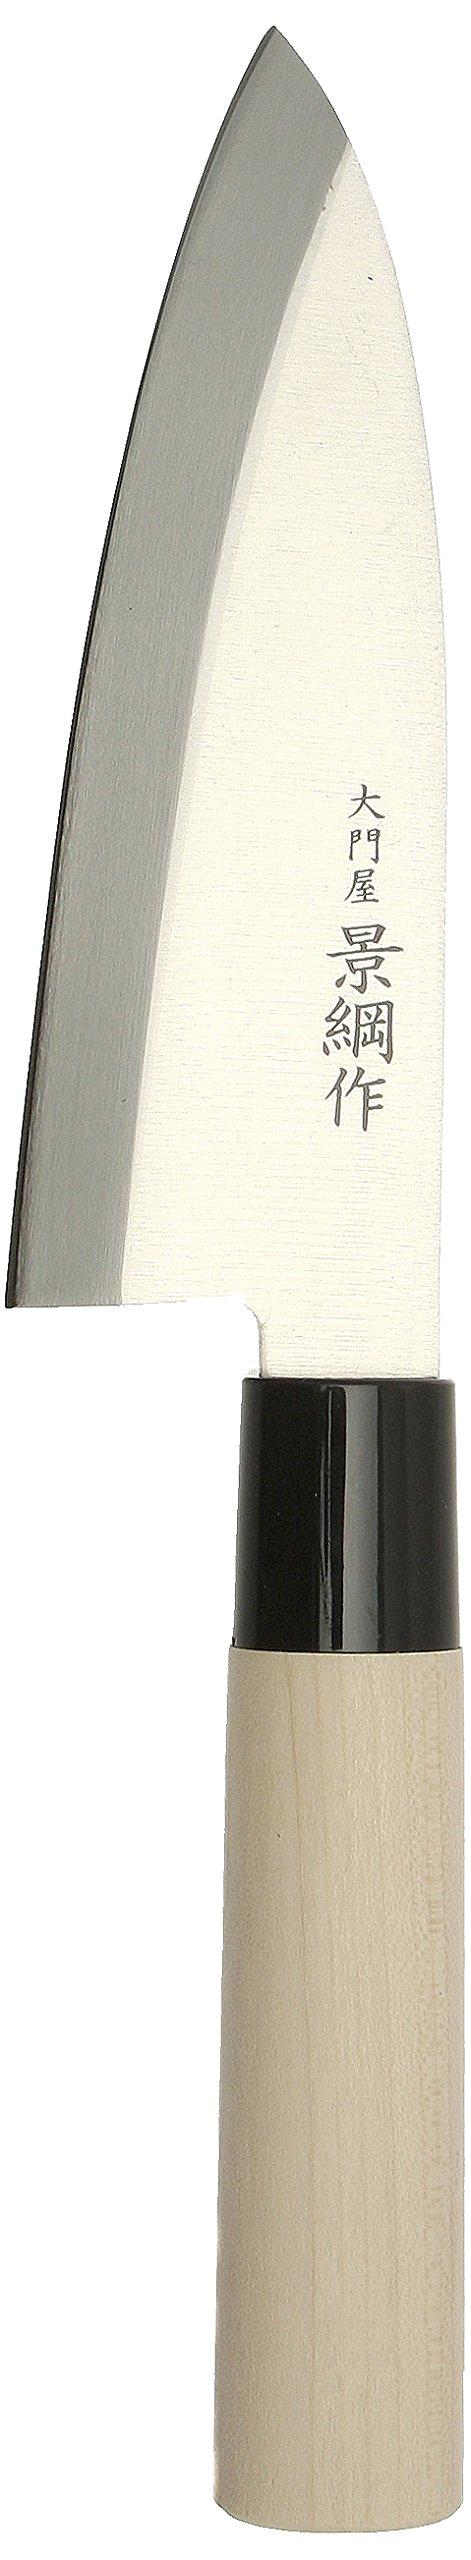 Kotobuki Kagetsuna Deba Japanese Kitchen Knife, Left-Handed